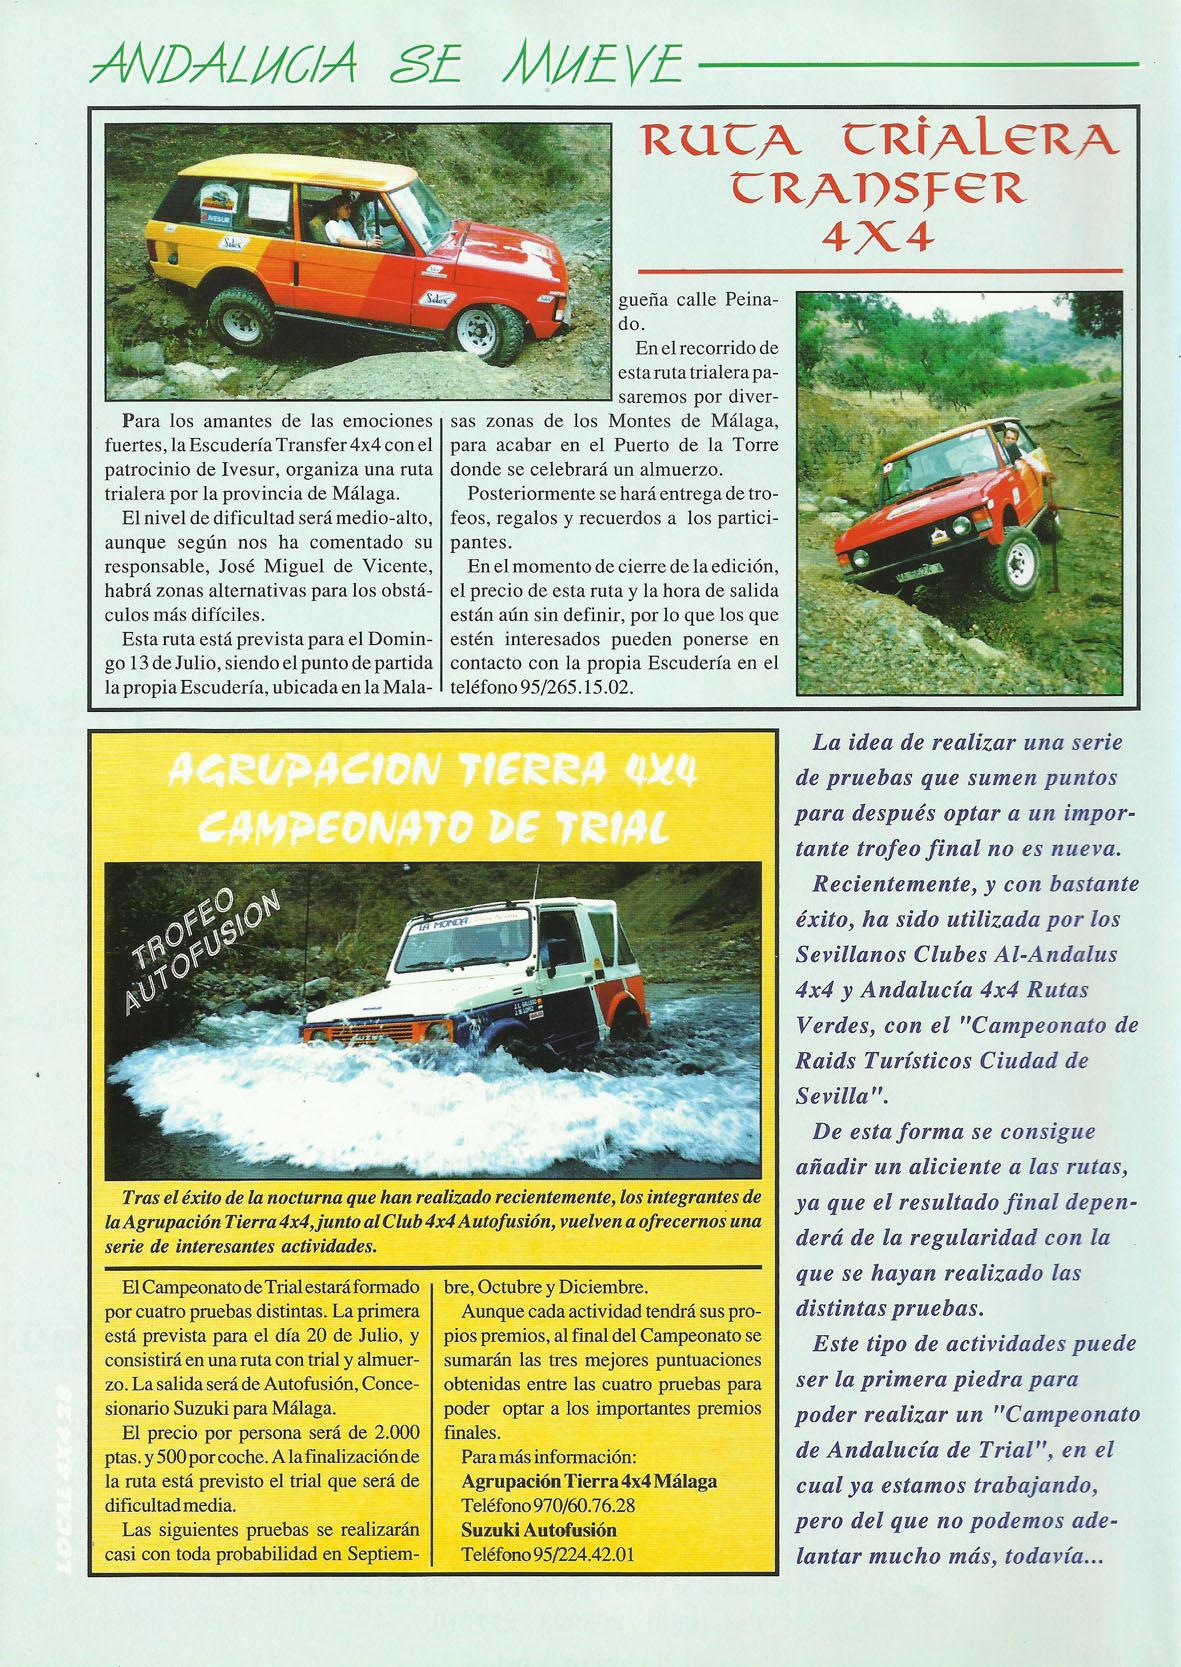 Revista Local 4x4 32 28 Próximas Actividades 01